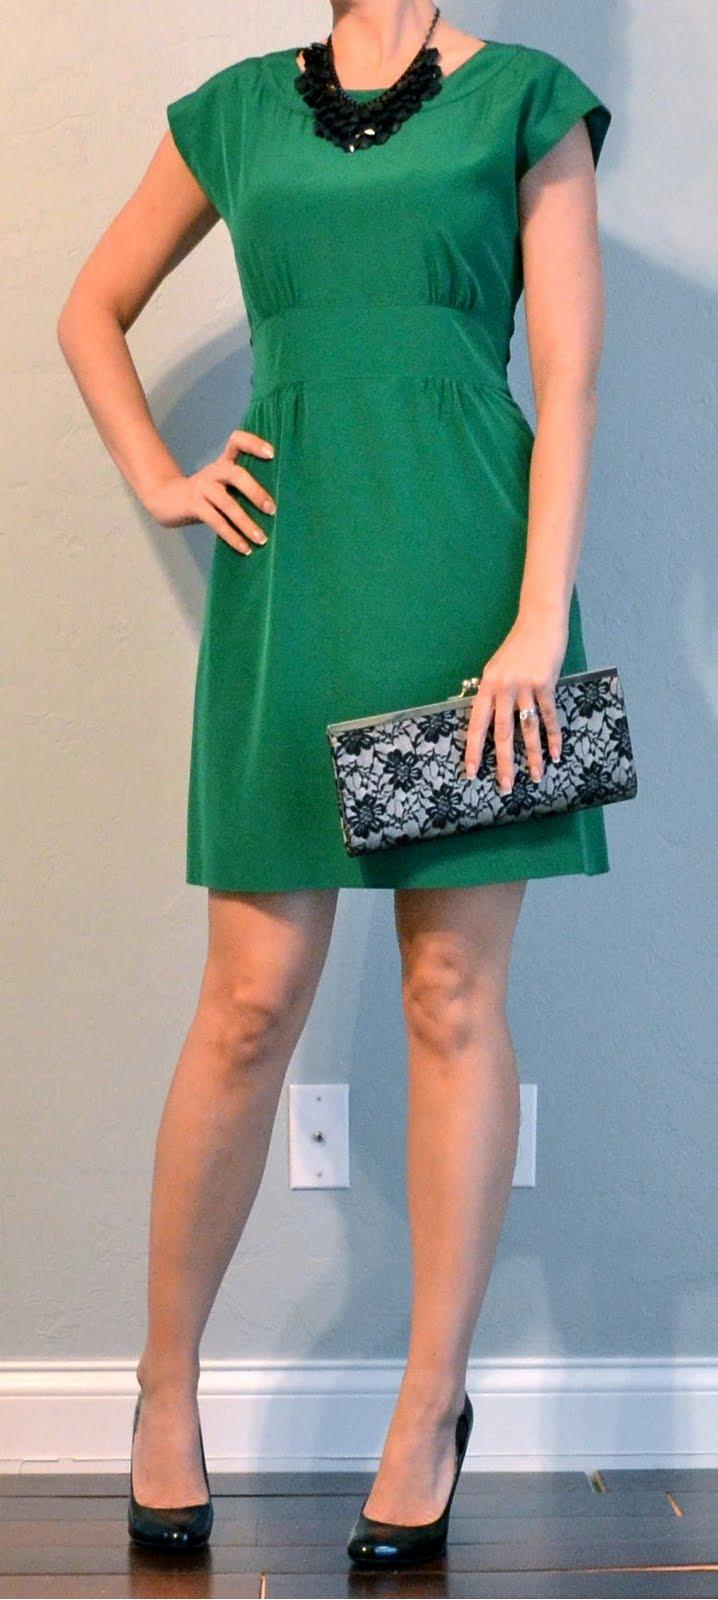 outfit post: green dress, black pumps, black bib necklace